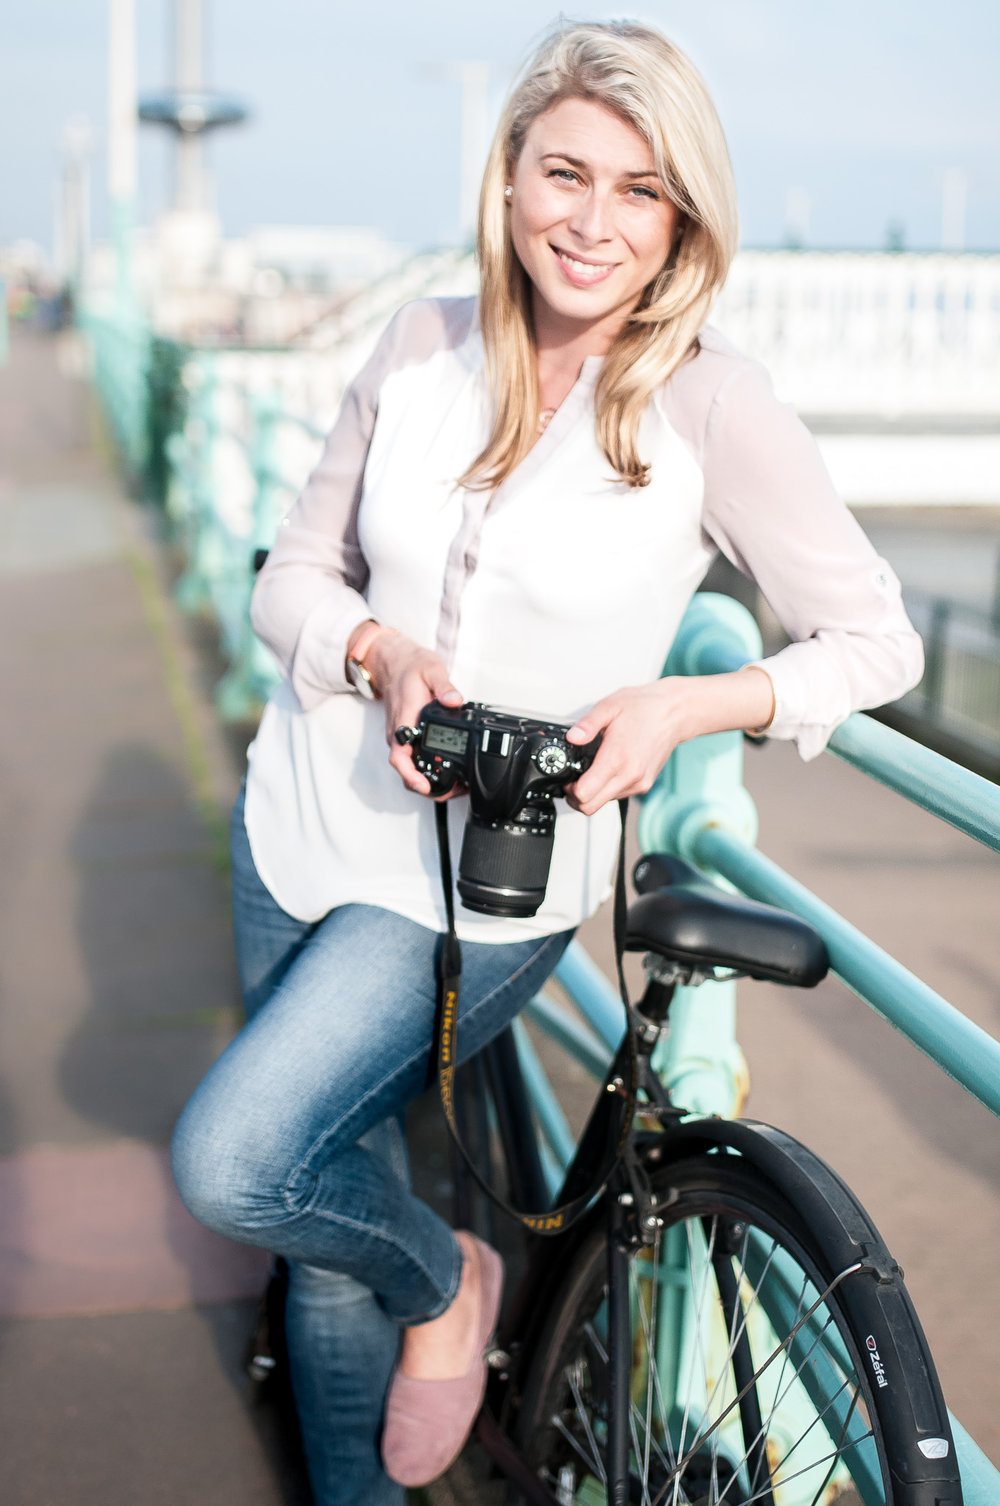 Personal Branding Portrait Photography with Magdalena Smolarska based in Brighton & London